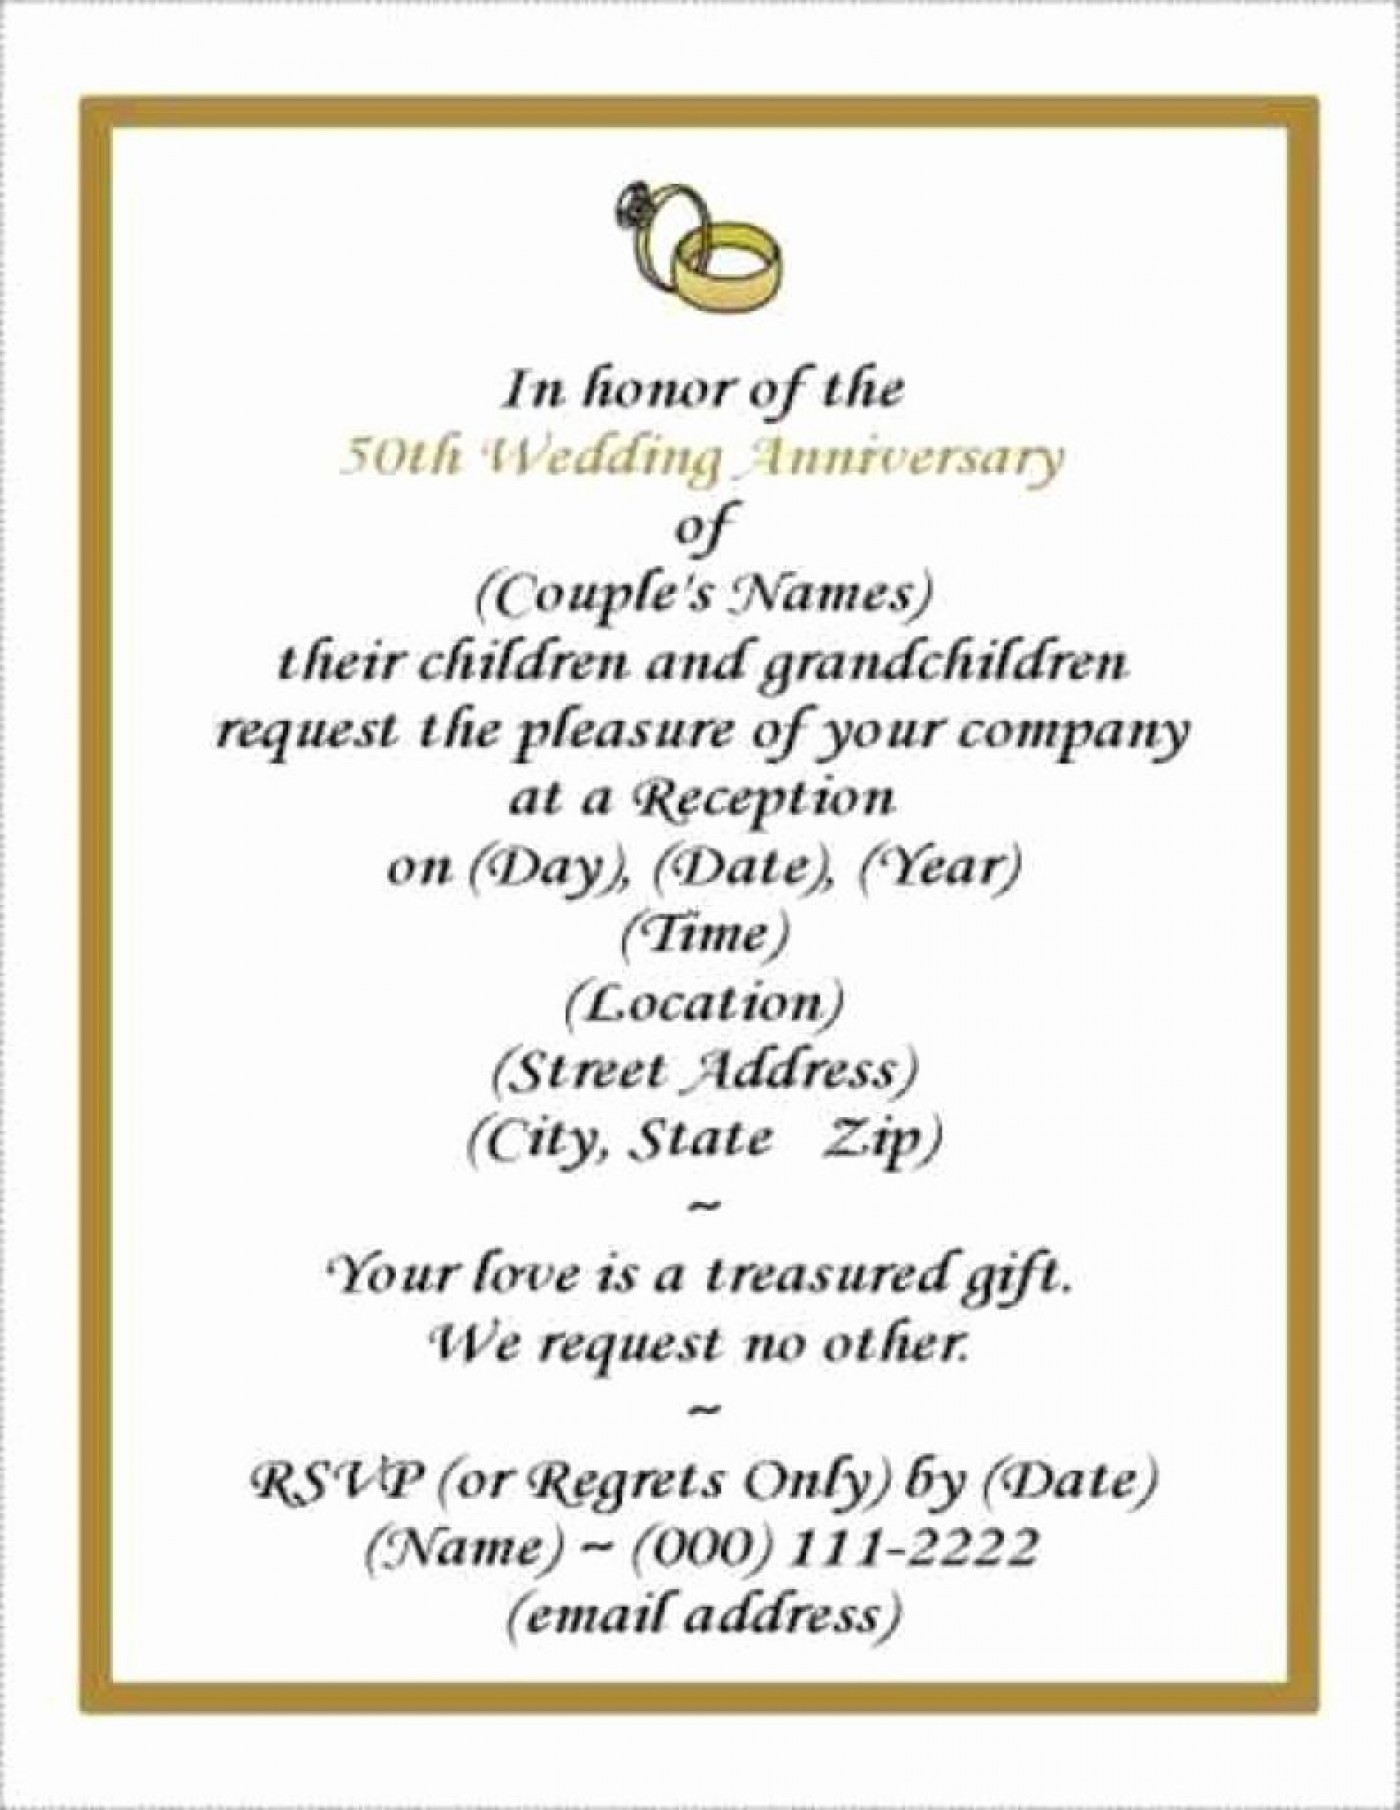 001 Rare Free Printable 50th Wedding Anniversary Invitation Template Design 1400